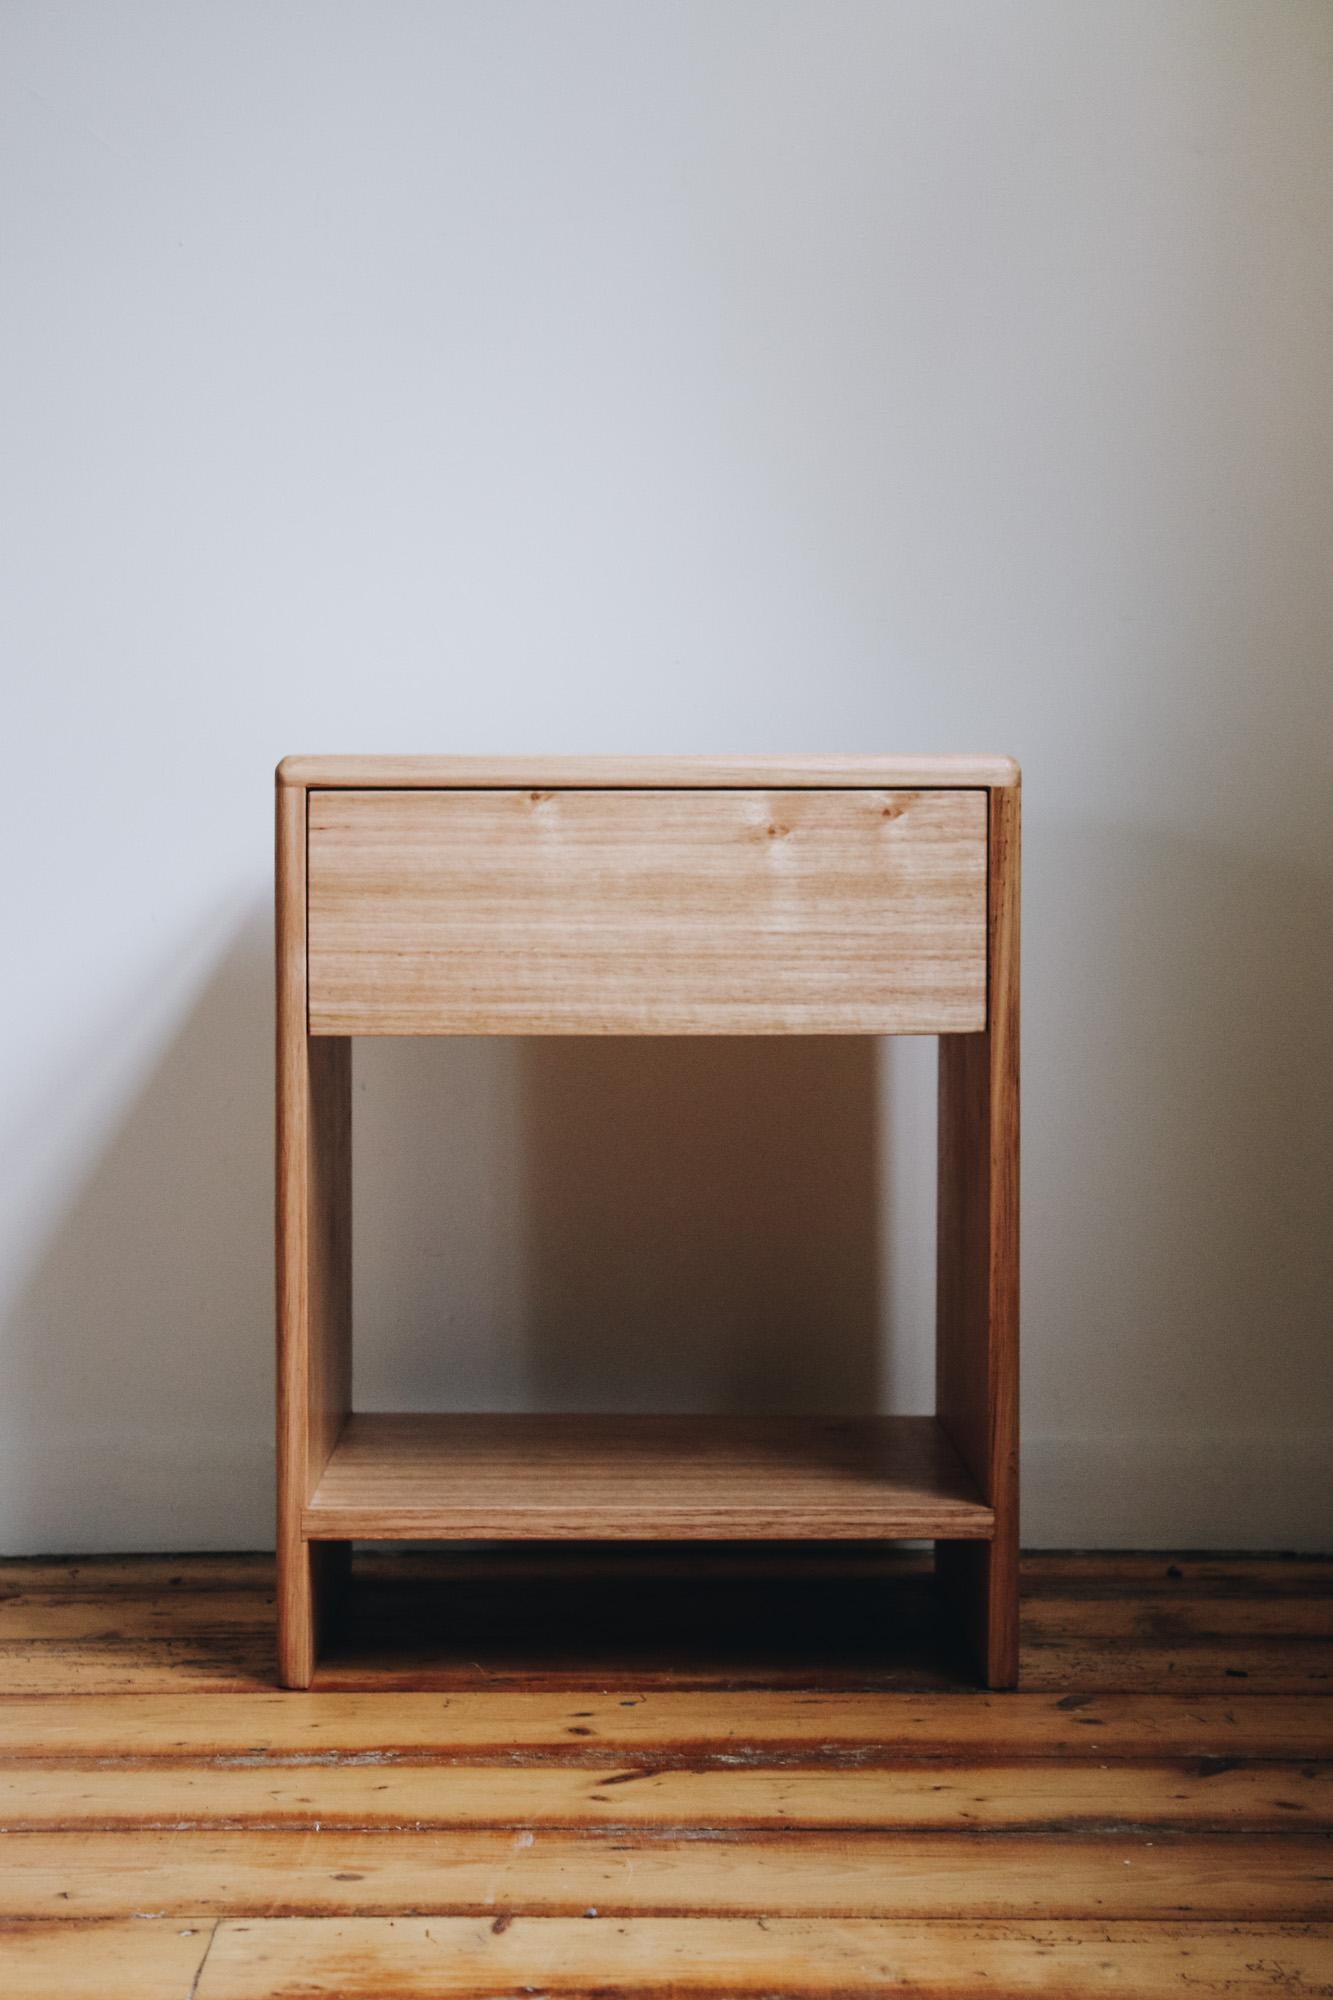 Al and Imo Handmade - Low Bedside Tables - Custom minimalst timber side drawer - Melbourne - Surf Coast - Australia-7.jpg